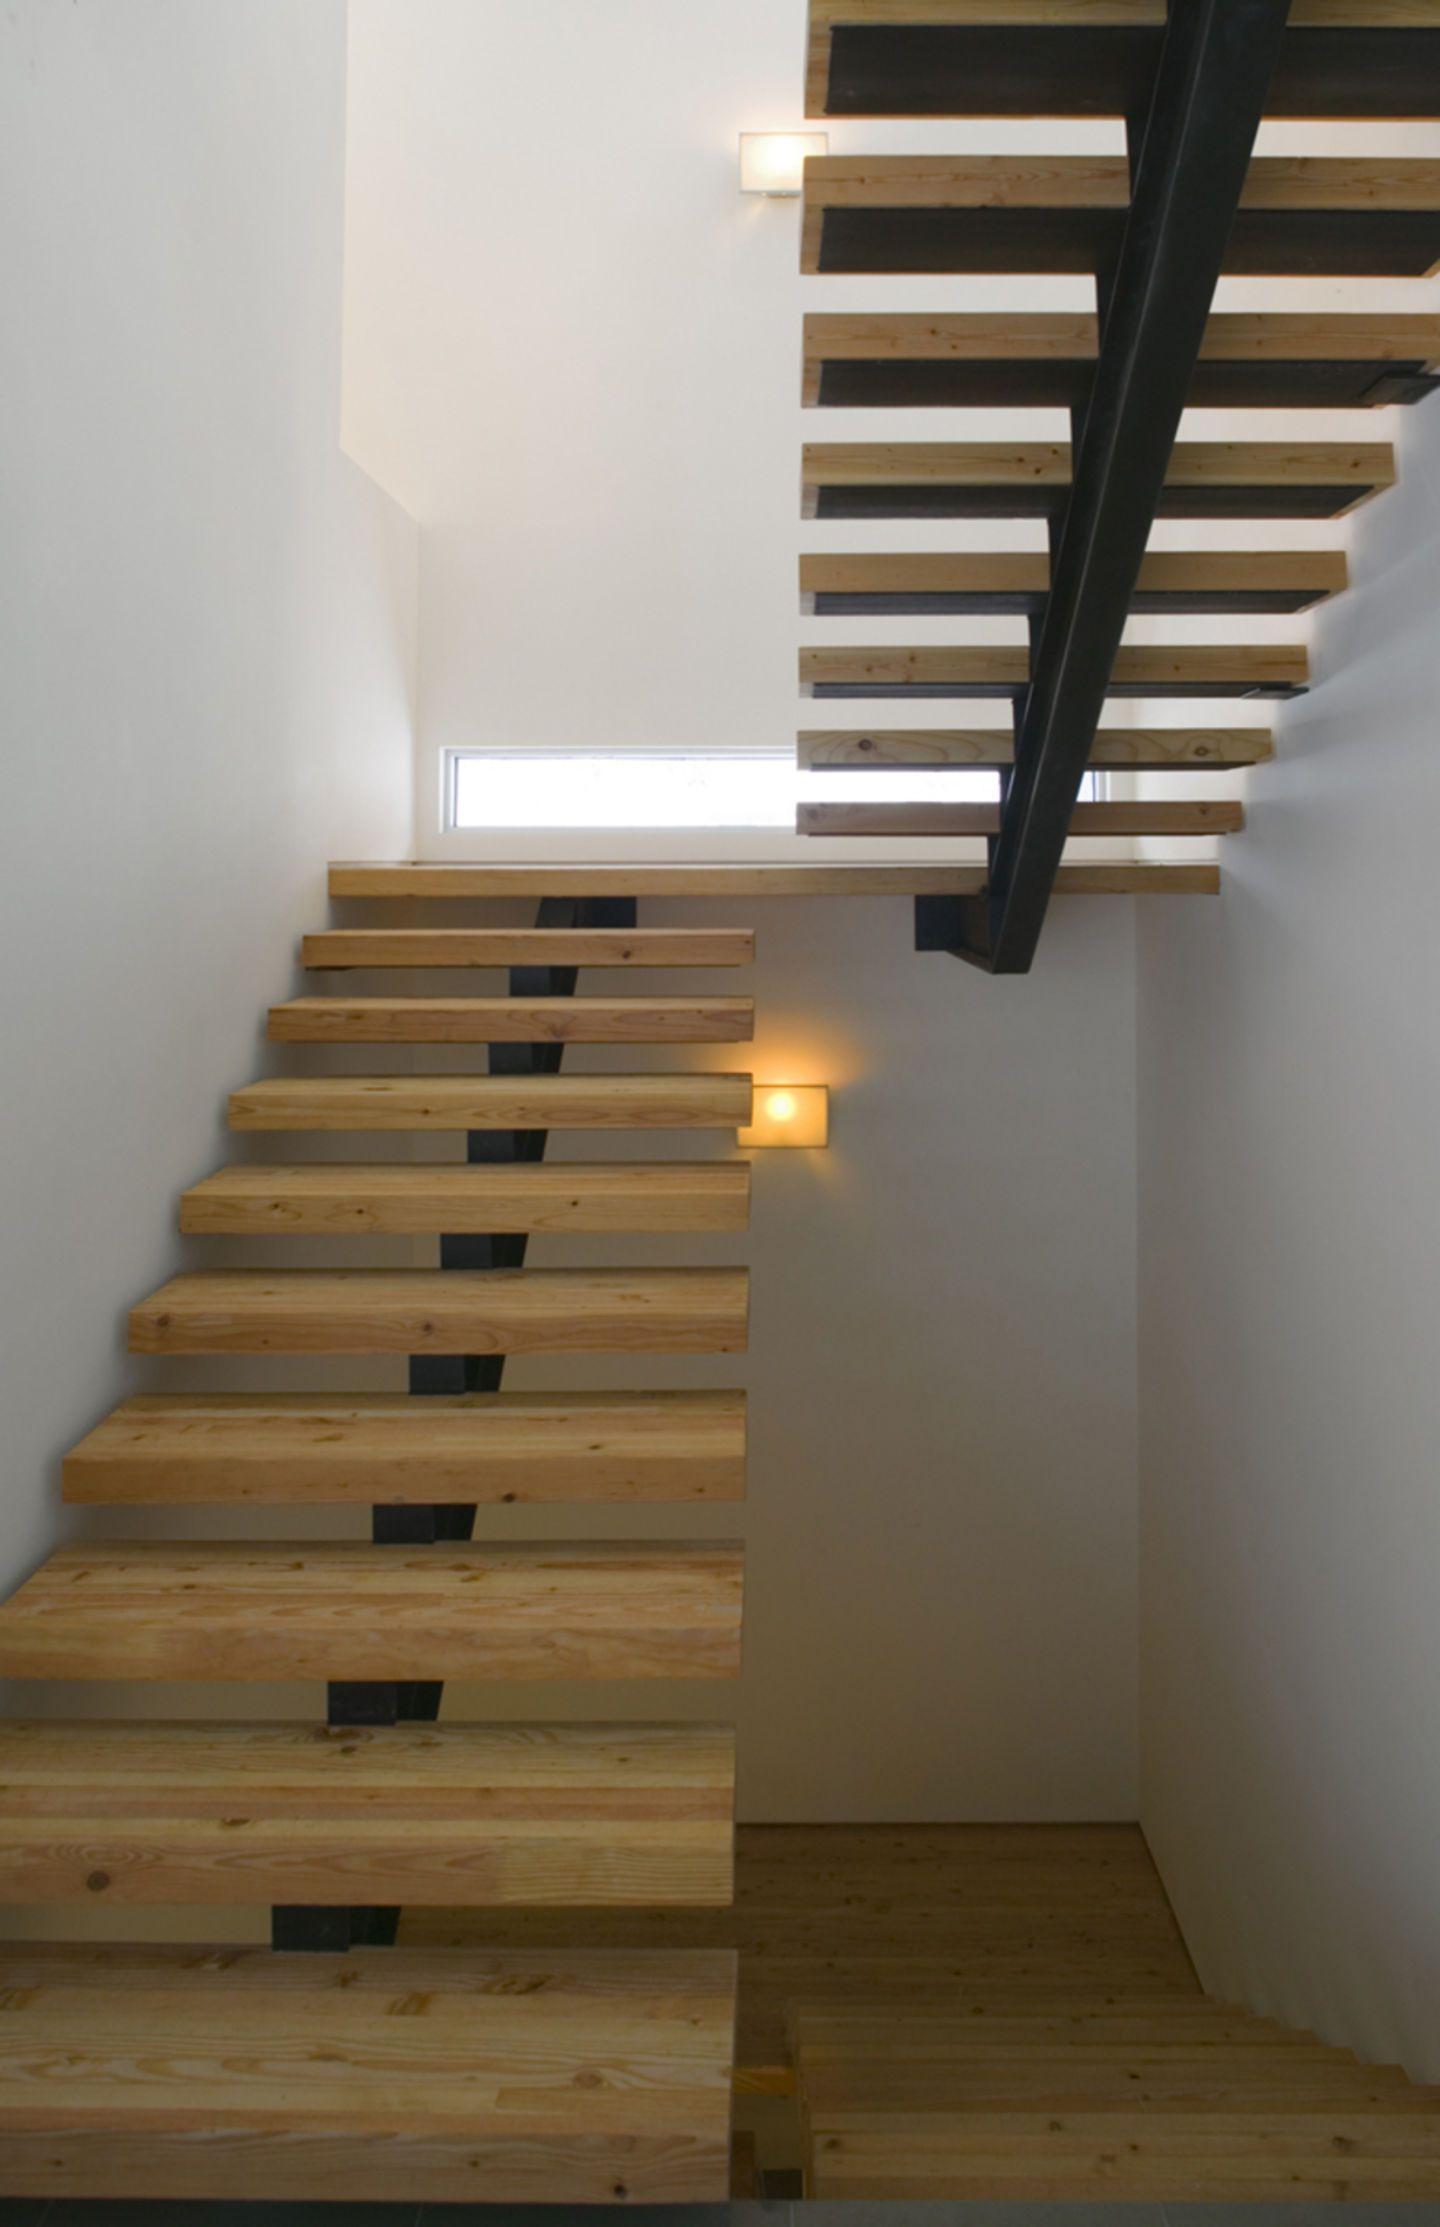 Michael P Johnson Design Studios Ltd Bill Timmerman Ruth Hiller Residence Divisare Escaleras Para Casas Pequenas Escaleras Modernas Escaleras Flotantes